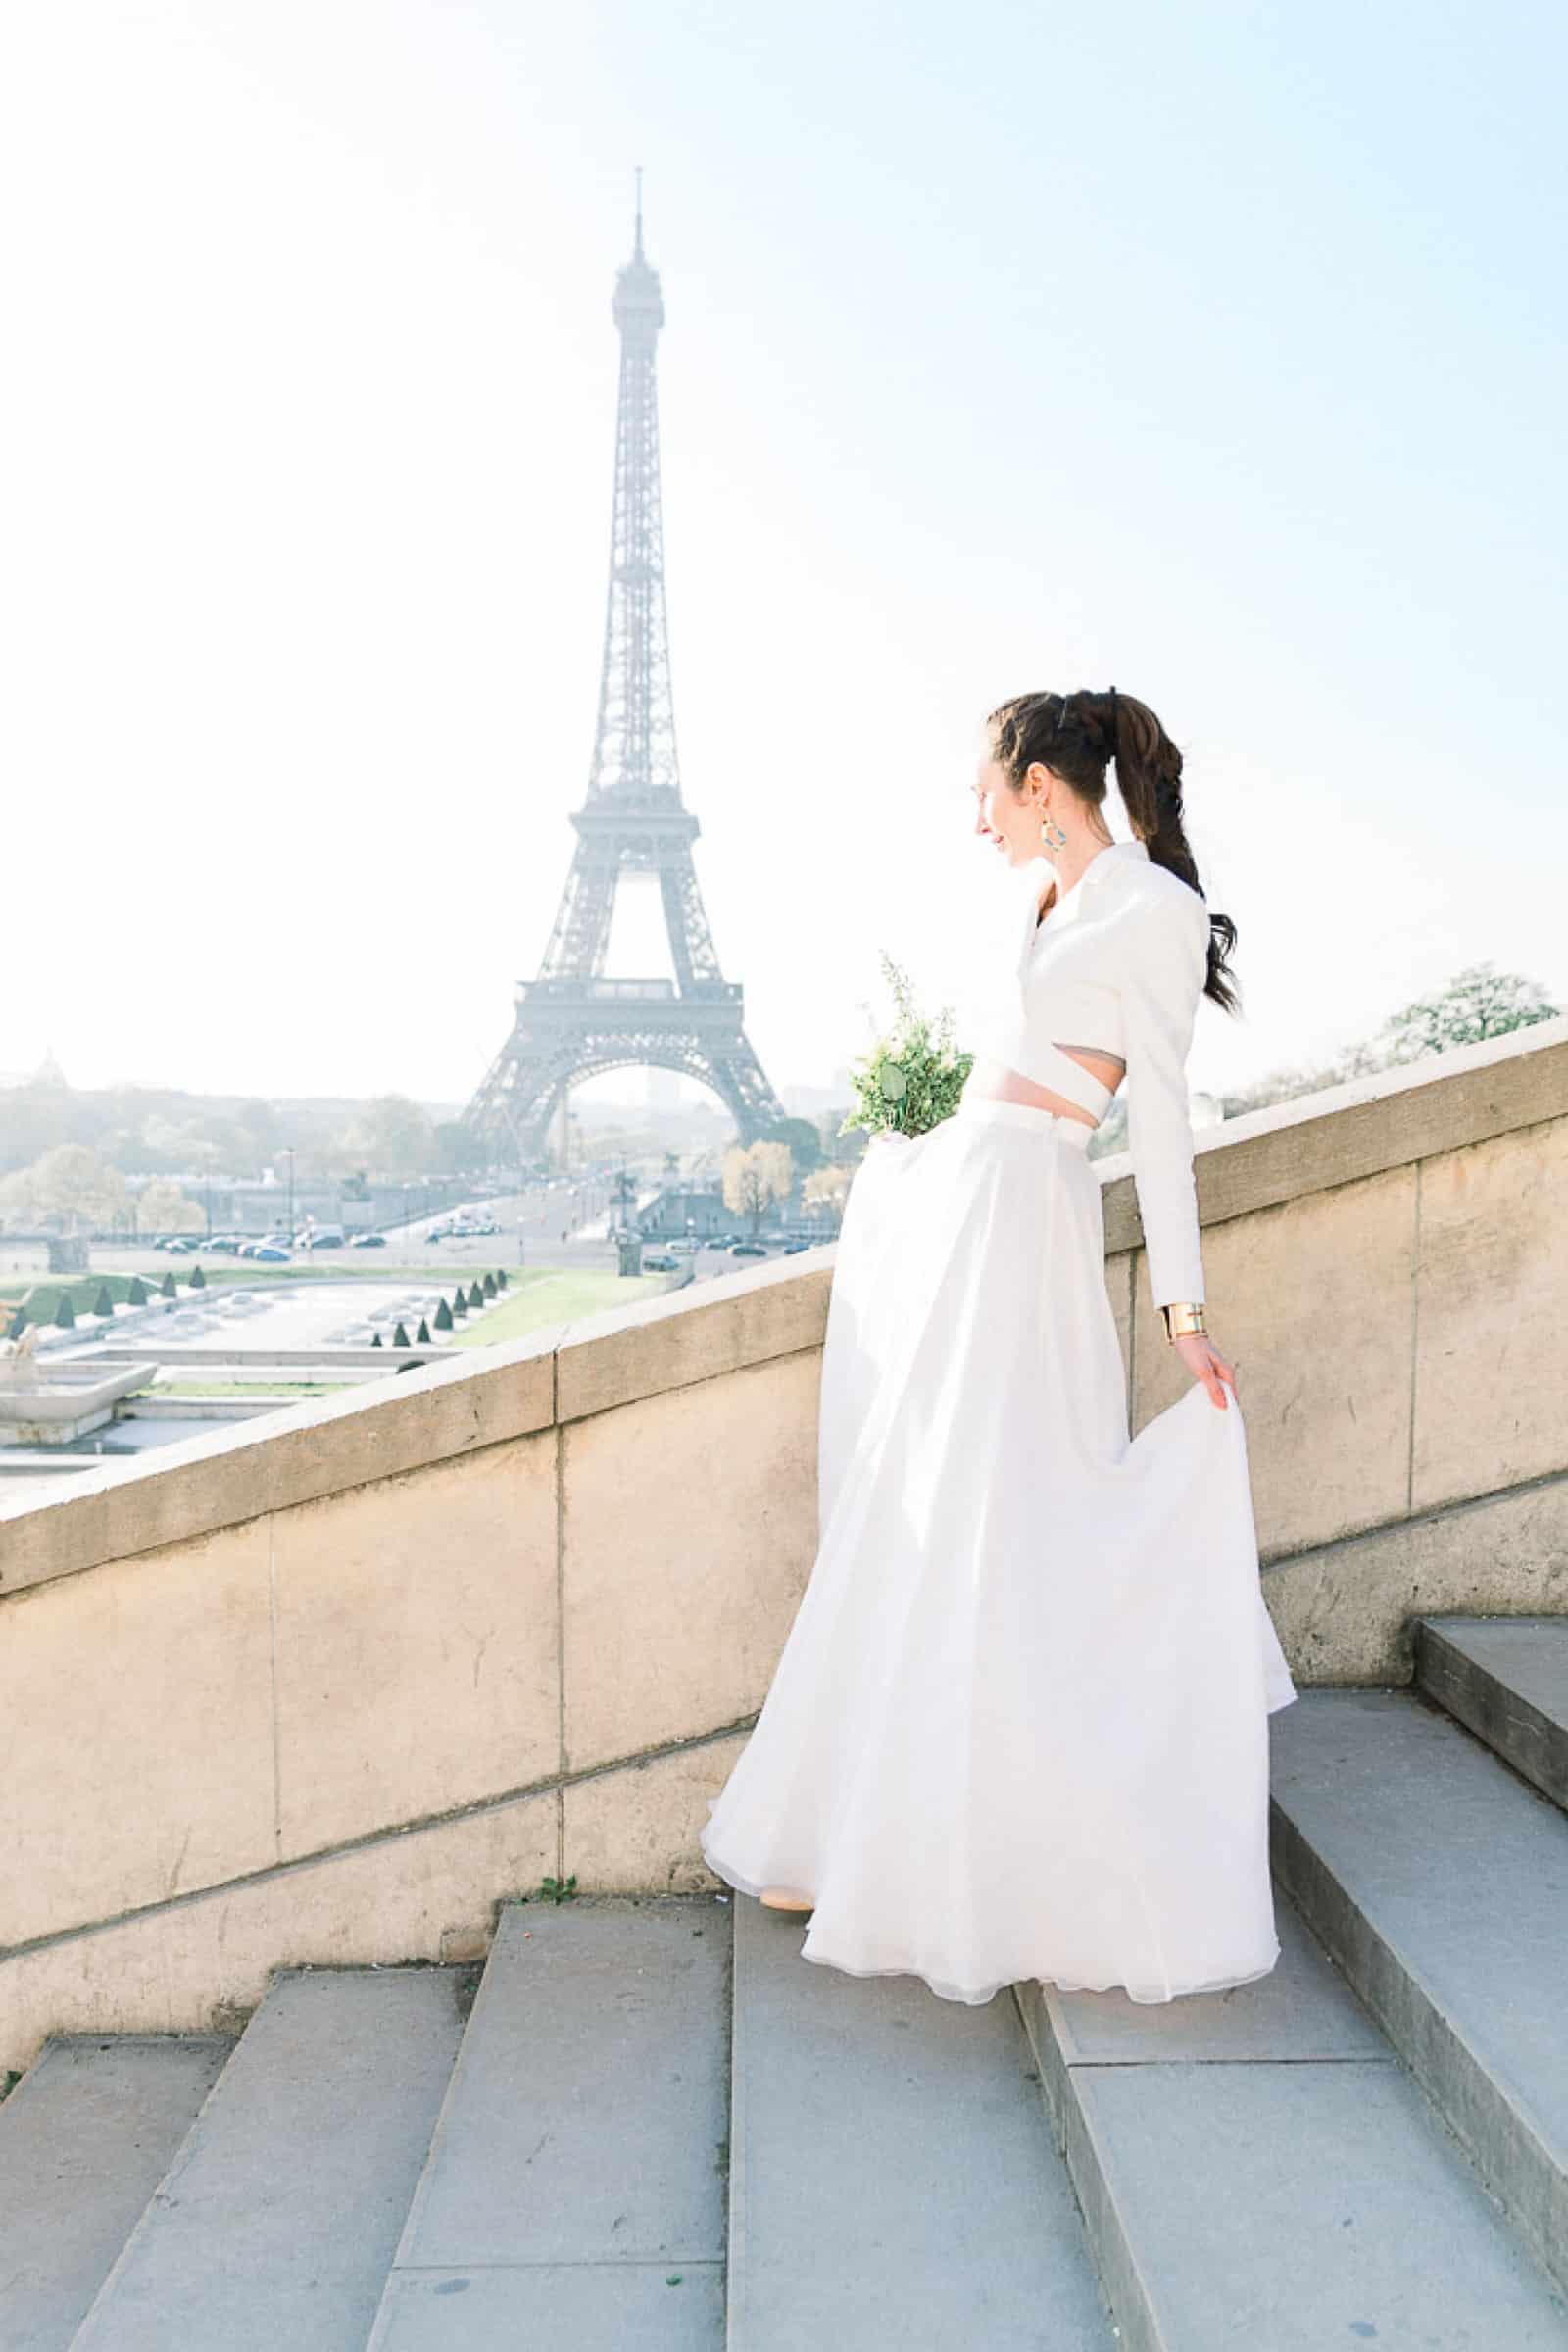 Modern Bride in Paris, France with Eiffel Tower